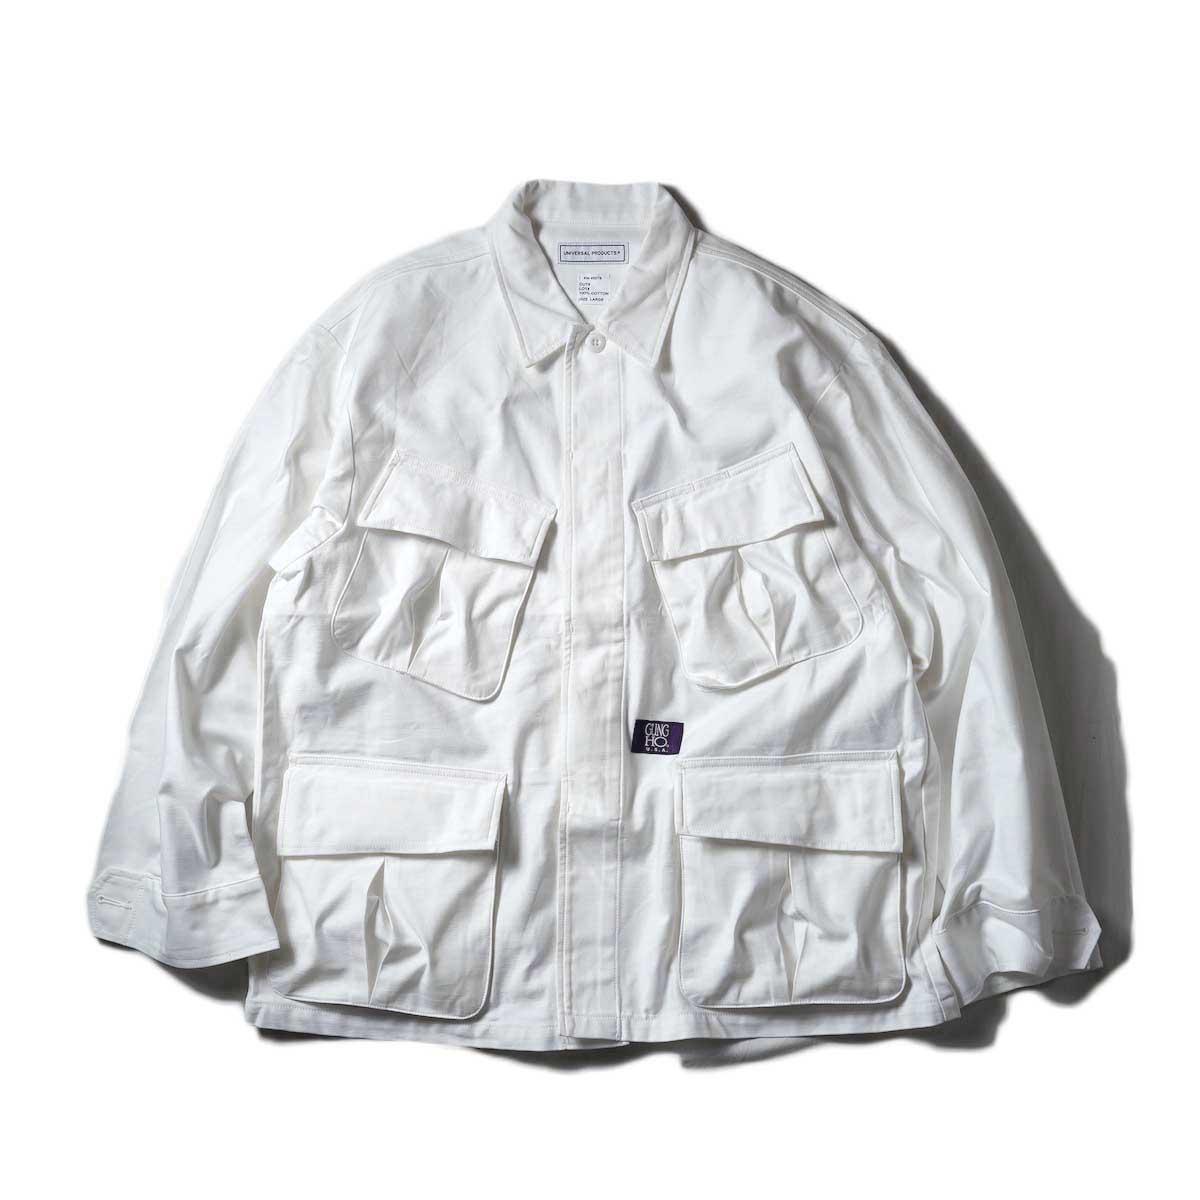 UNIVERSAL PRODUCTS / Gung Ho Fatigue Jacket (Ivory)